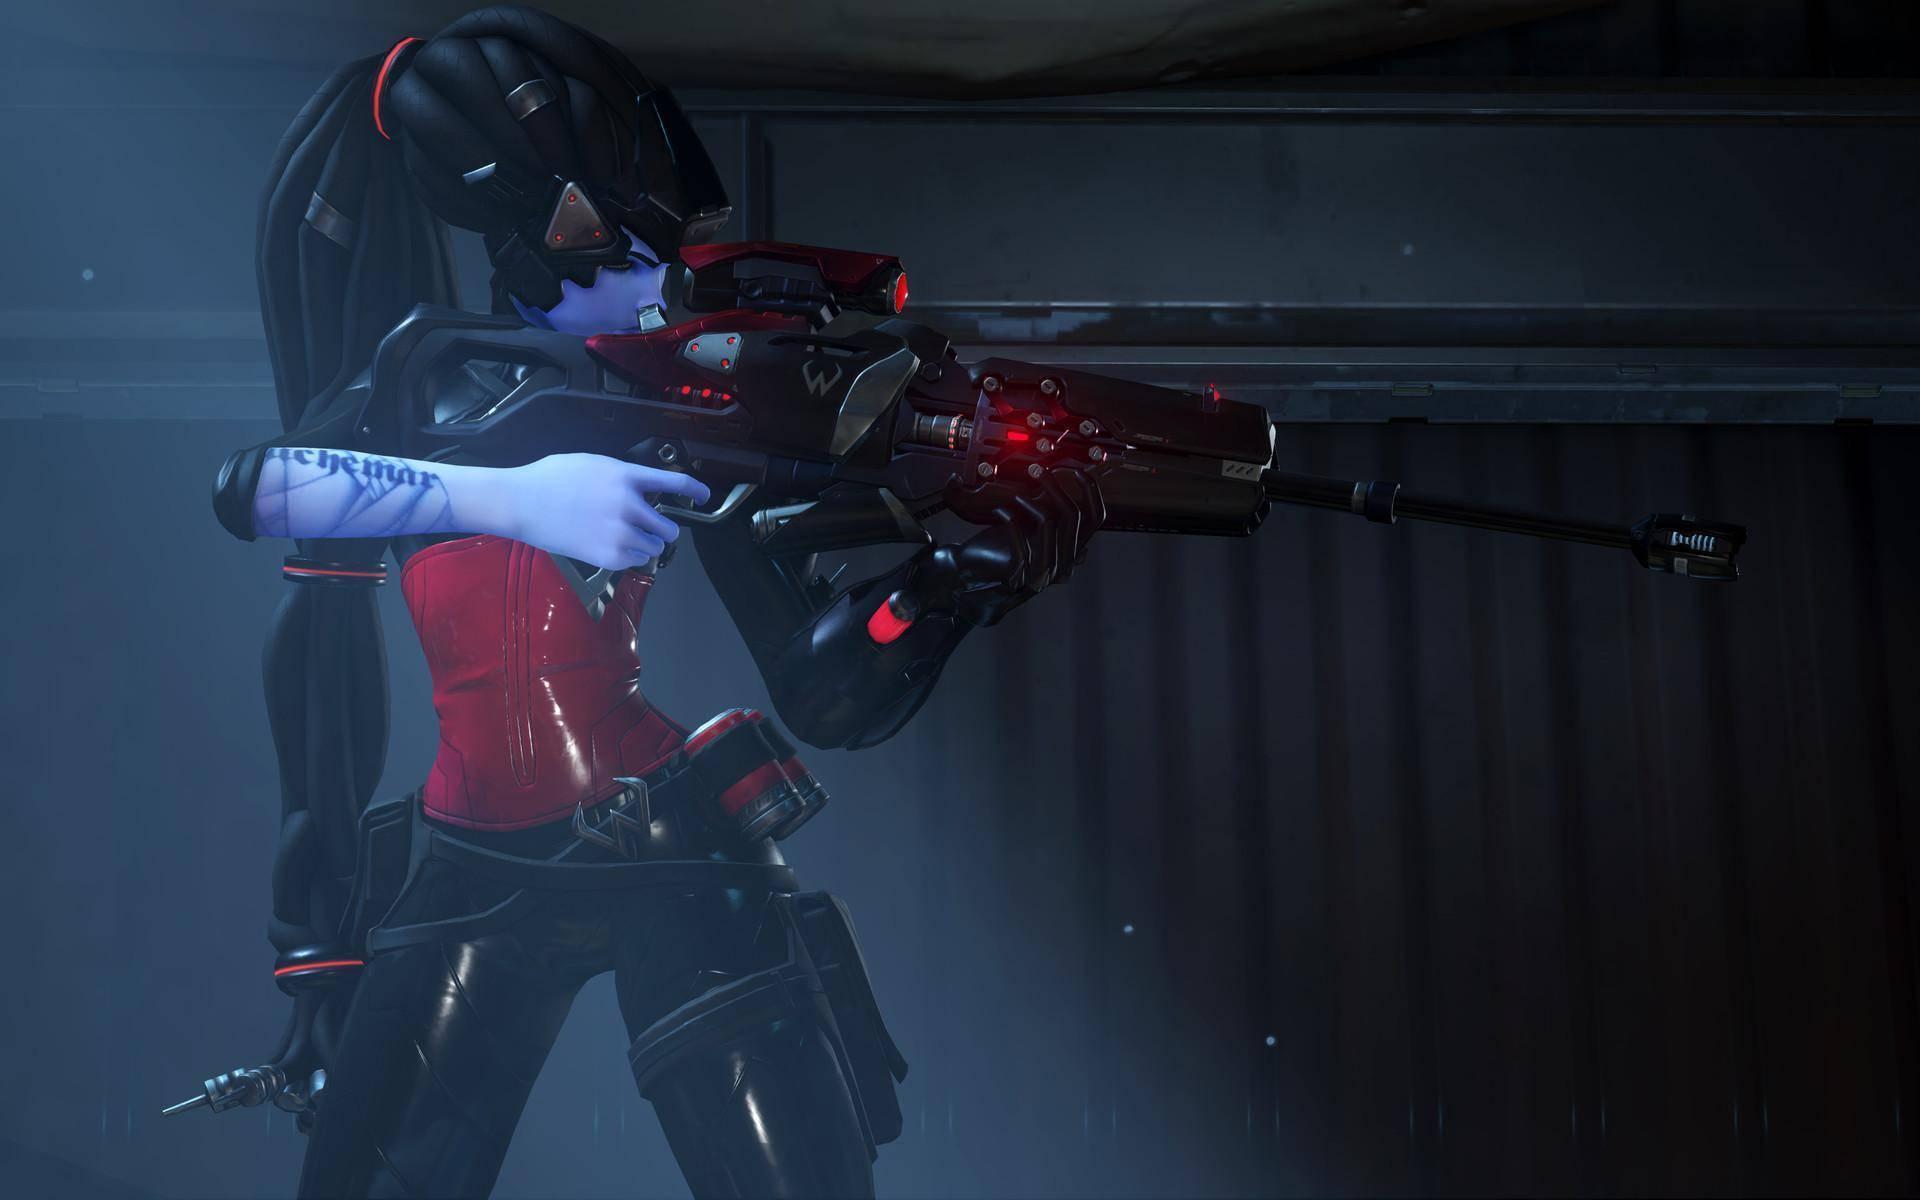 Overwatch Widowmaker Noire Skin